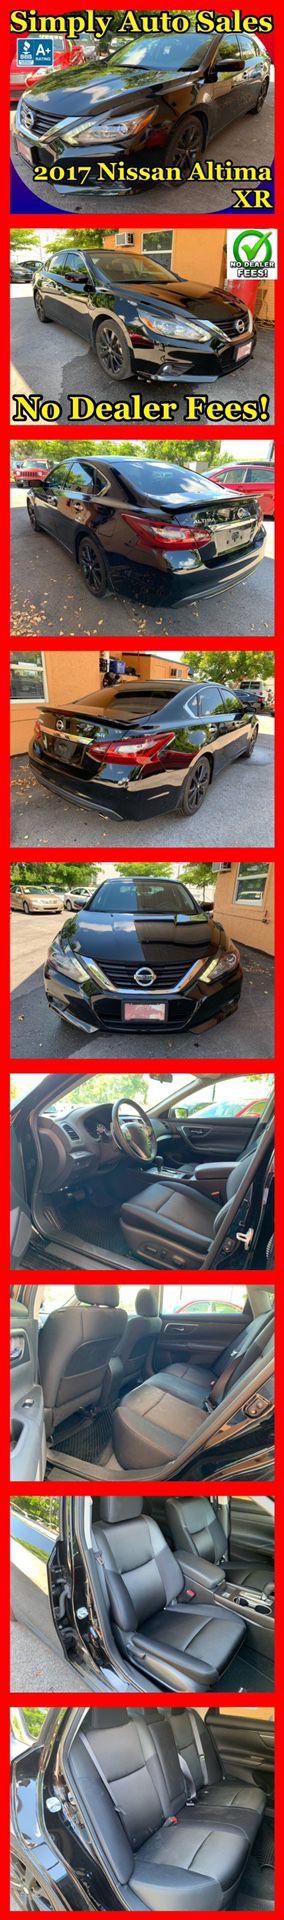 2017 Nissan Altima XR for Sale in West Palm Beach, FL